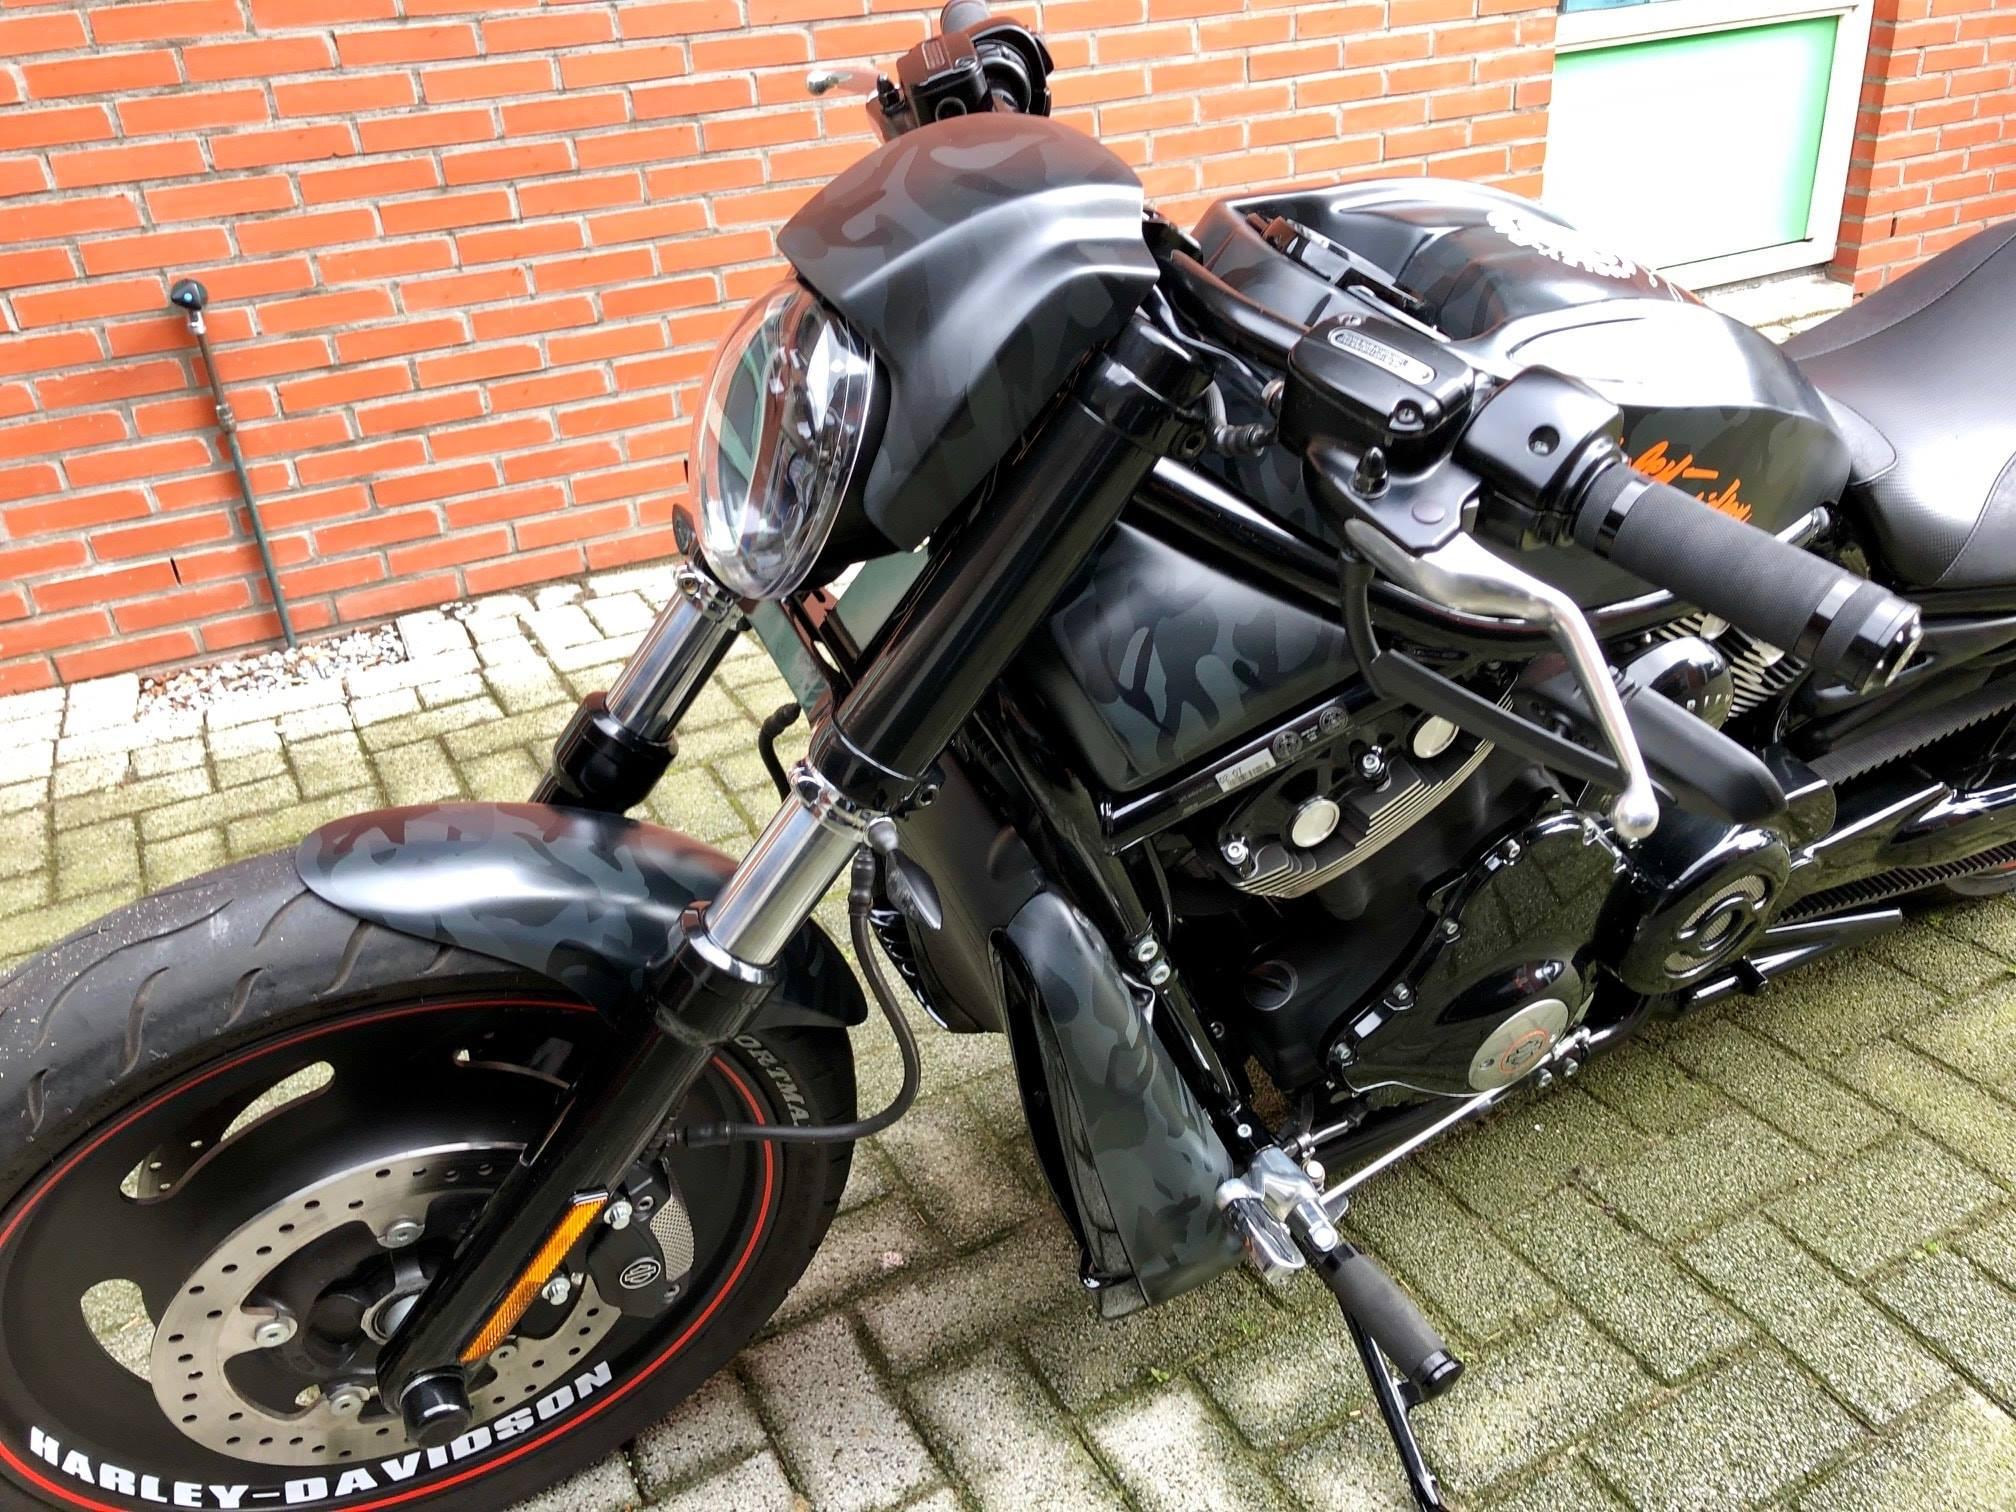 Harley davidson V-rod fsb-dip.nl hydrodipping camo